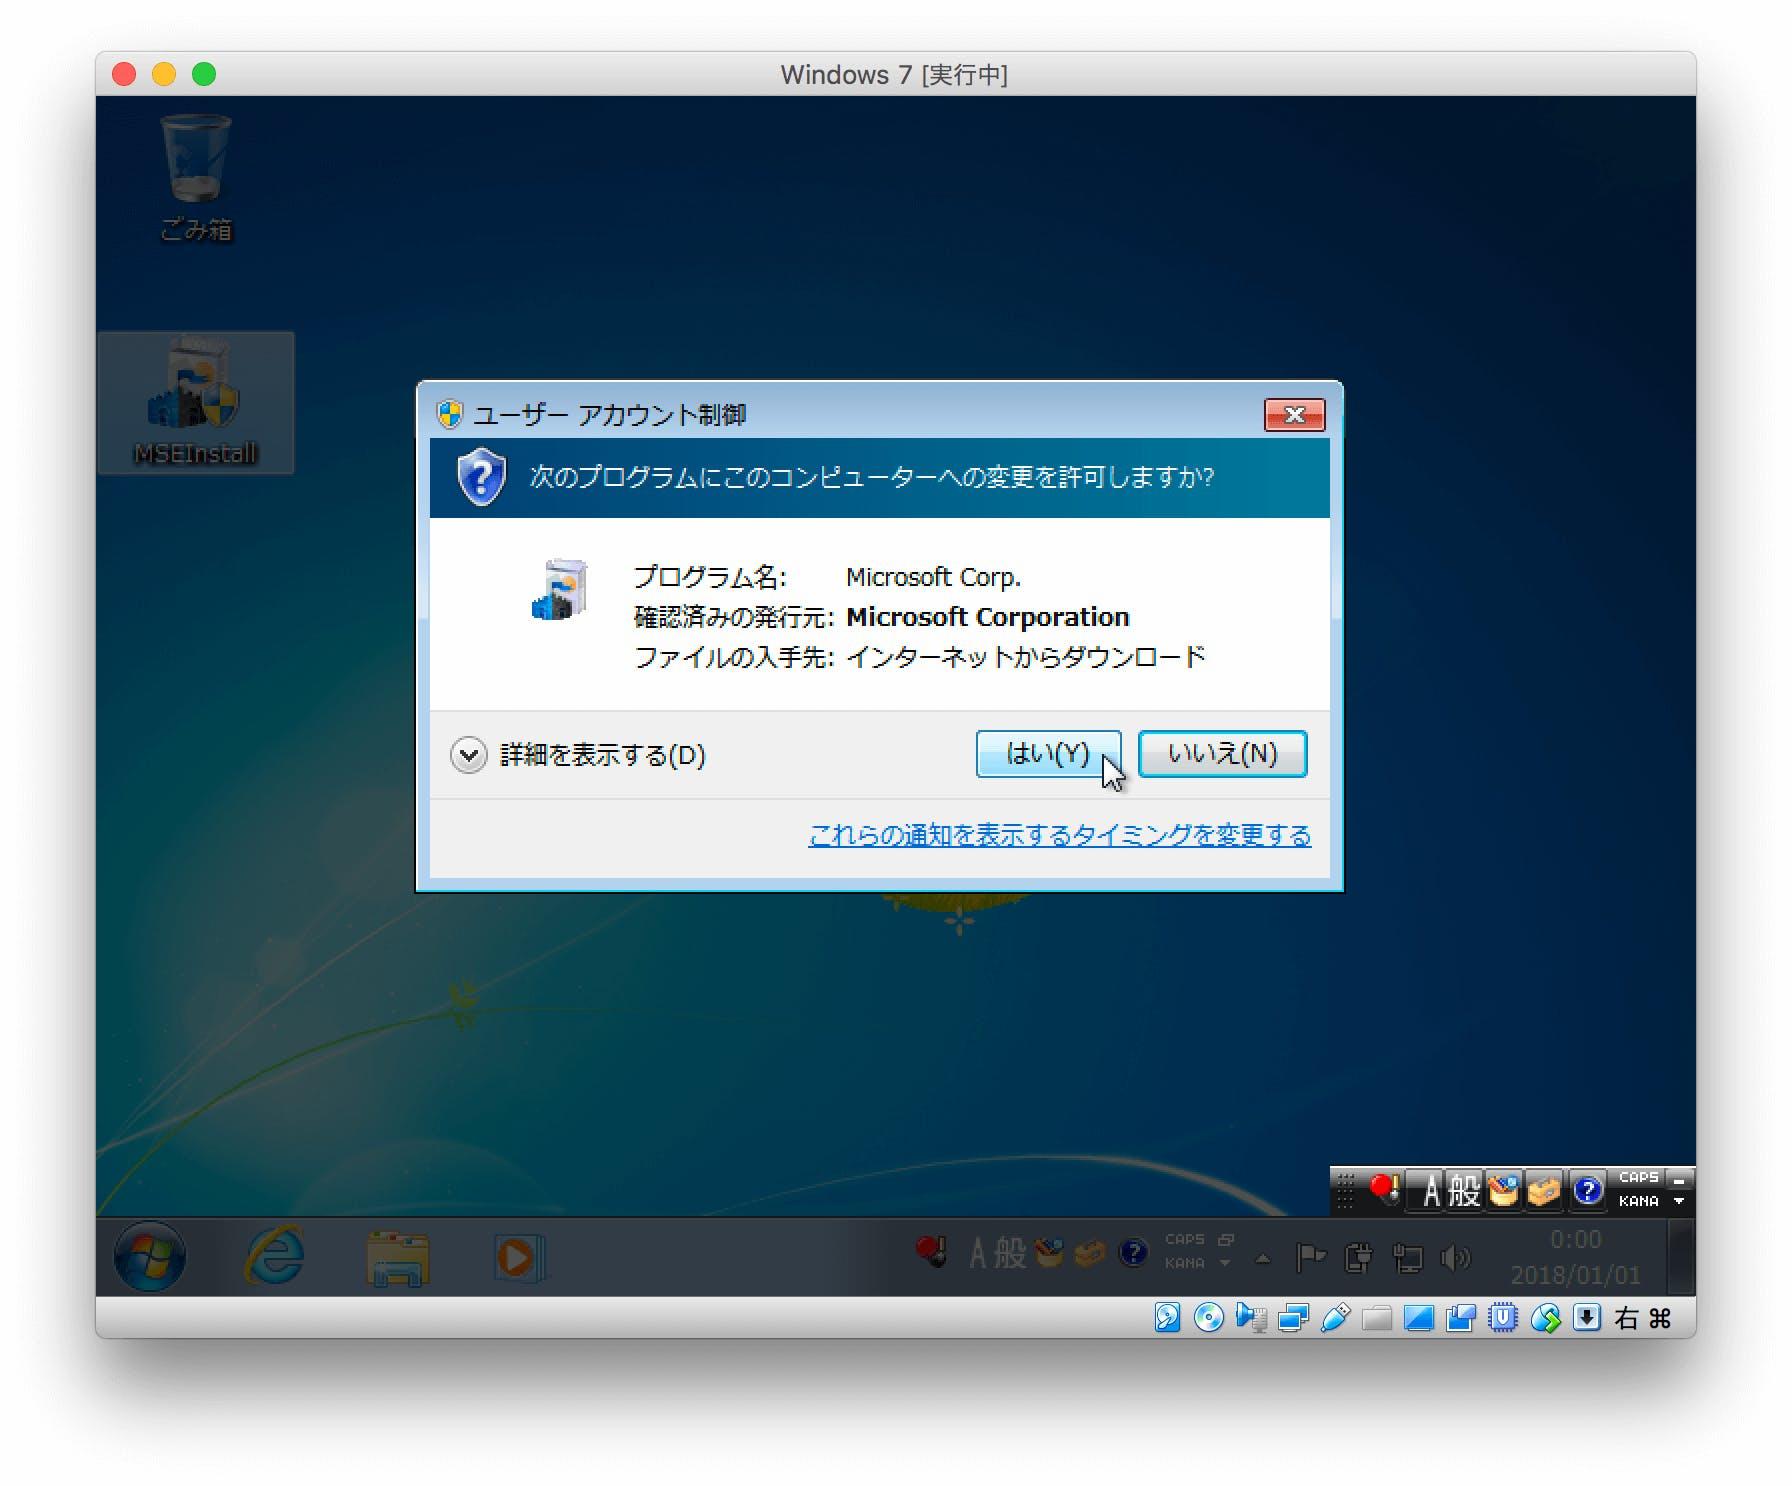 Windows 7 に Microsoft Security Essentials をインストールして無料で